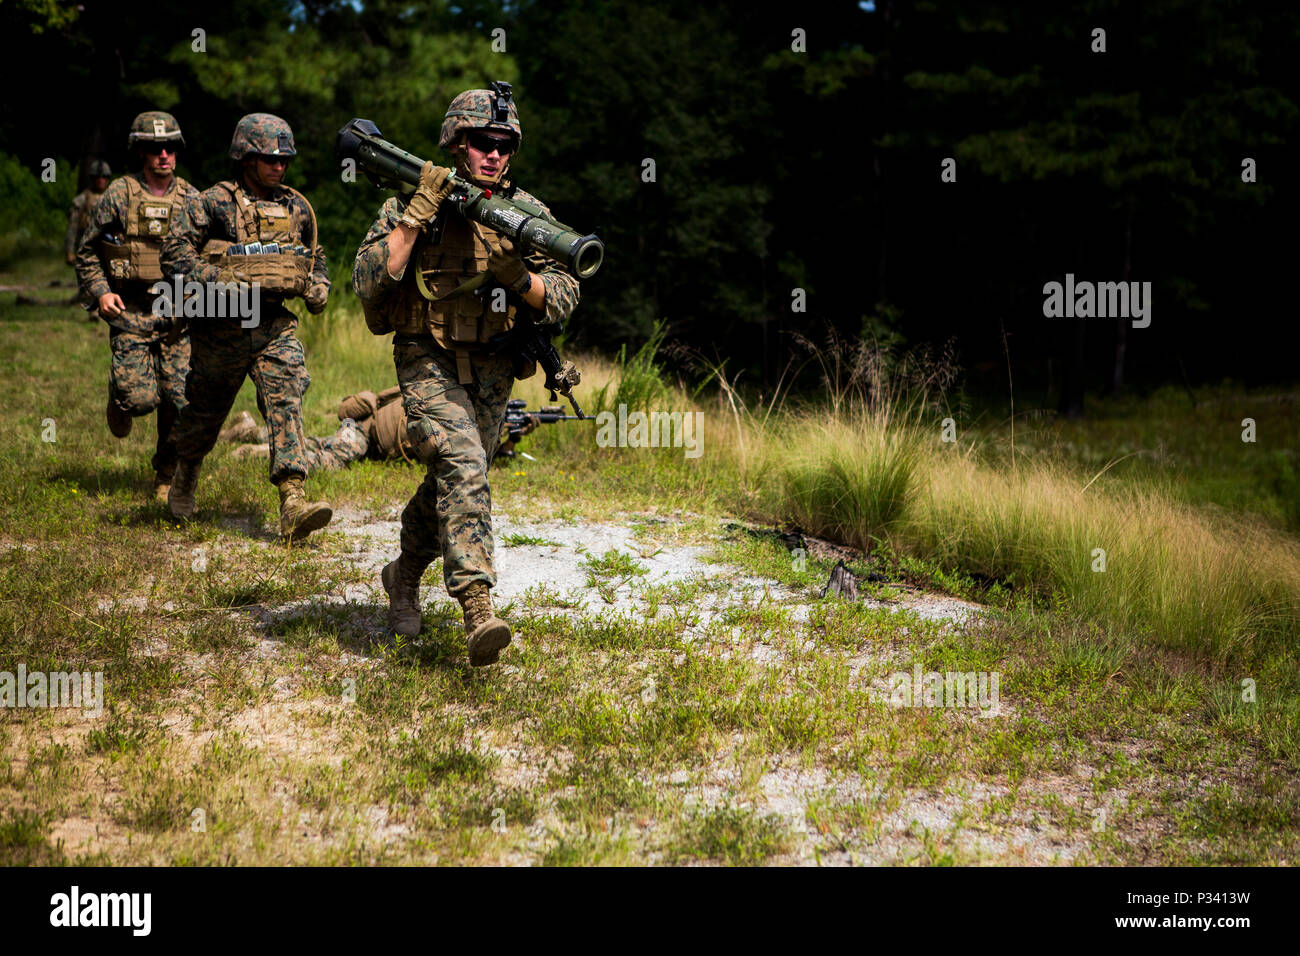 M136 Stock Photos & M136 Stock Images - Alamy